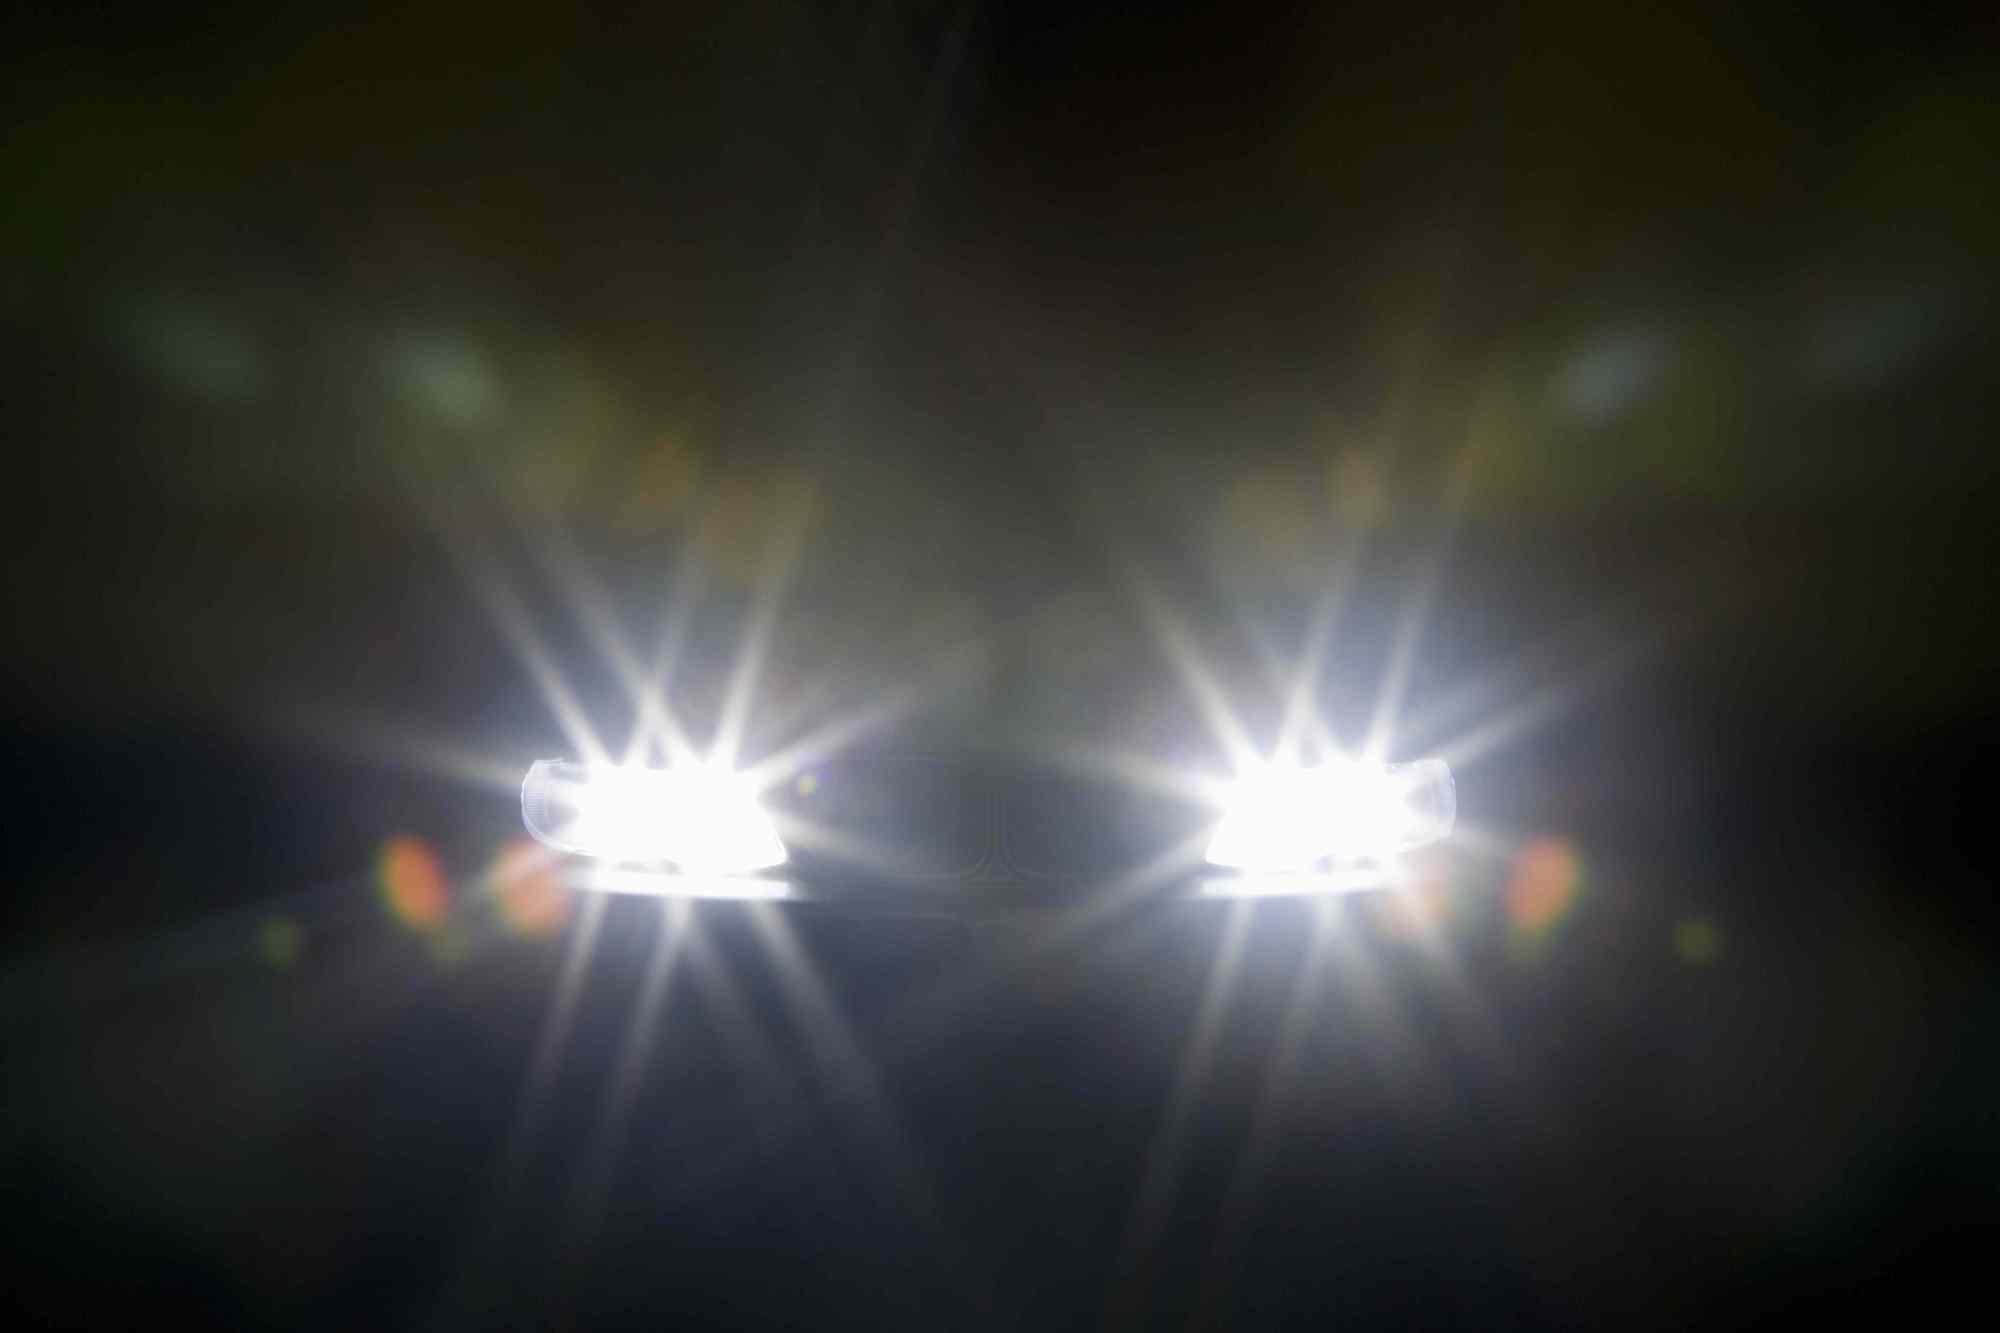 hight resolution of a car headlights illuminated at night